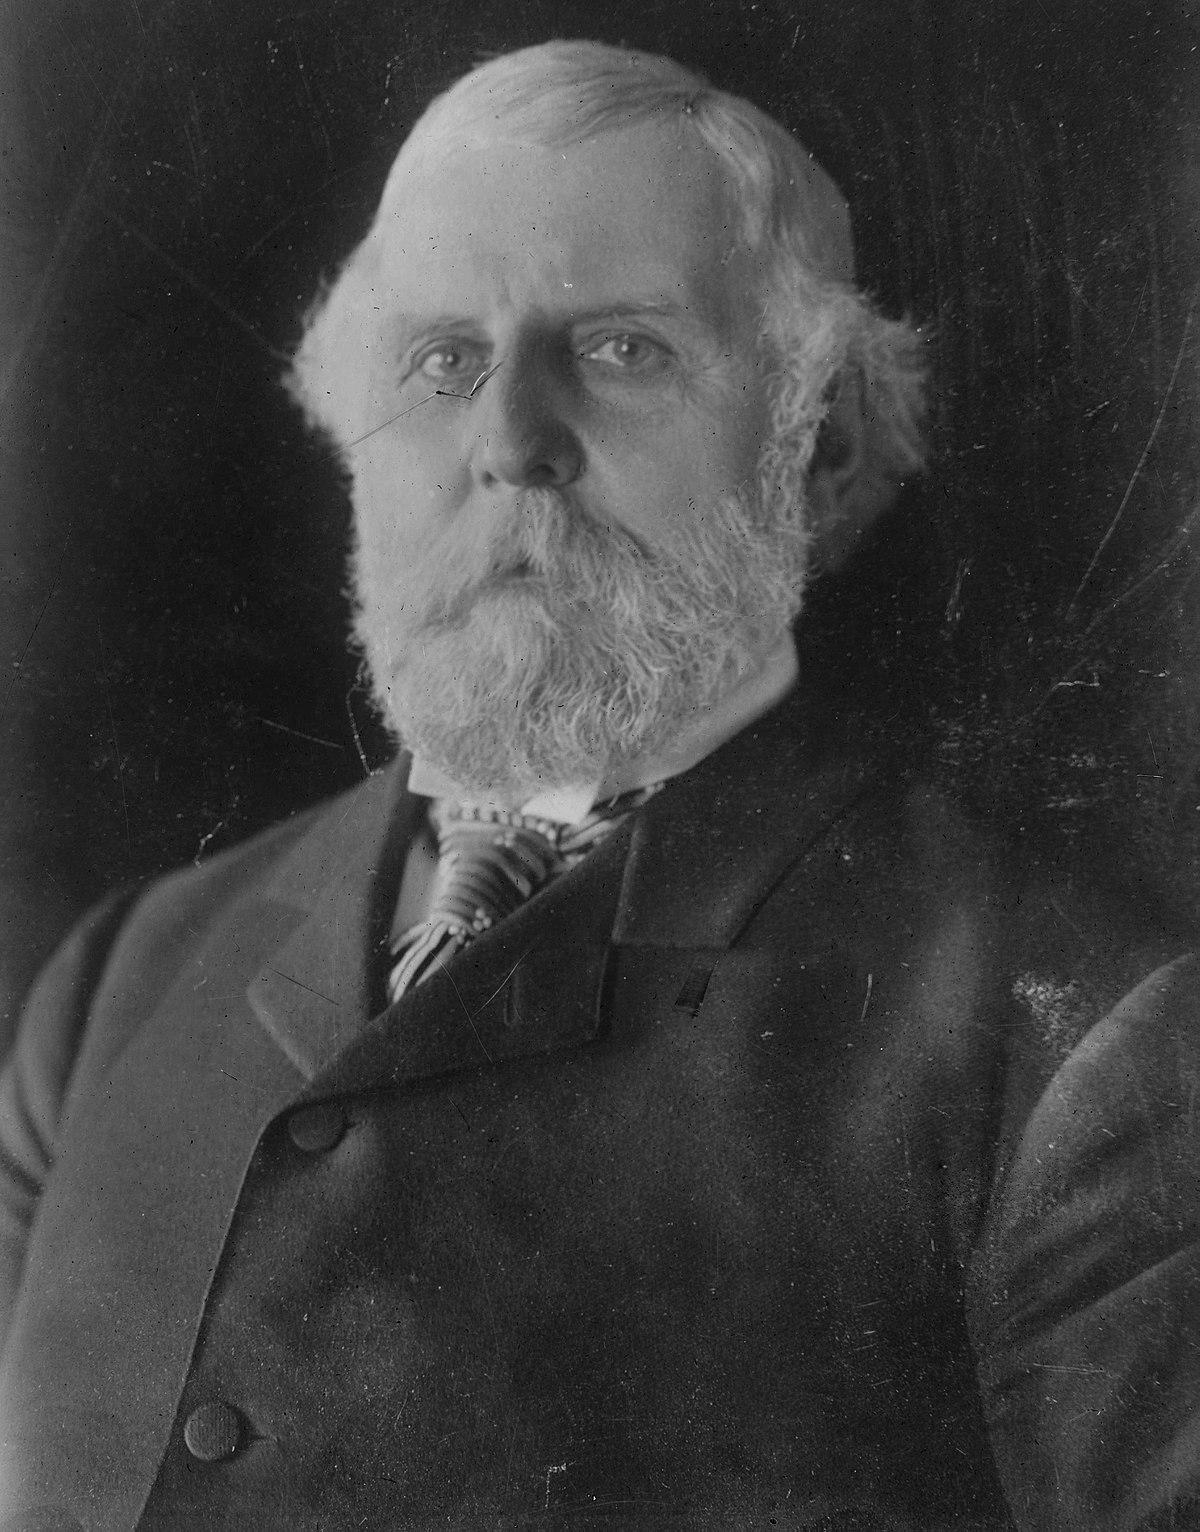 Lyman J. Gage - Wikipedia